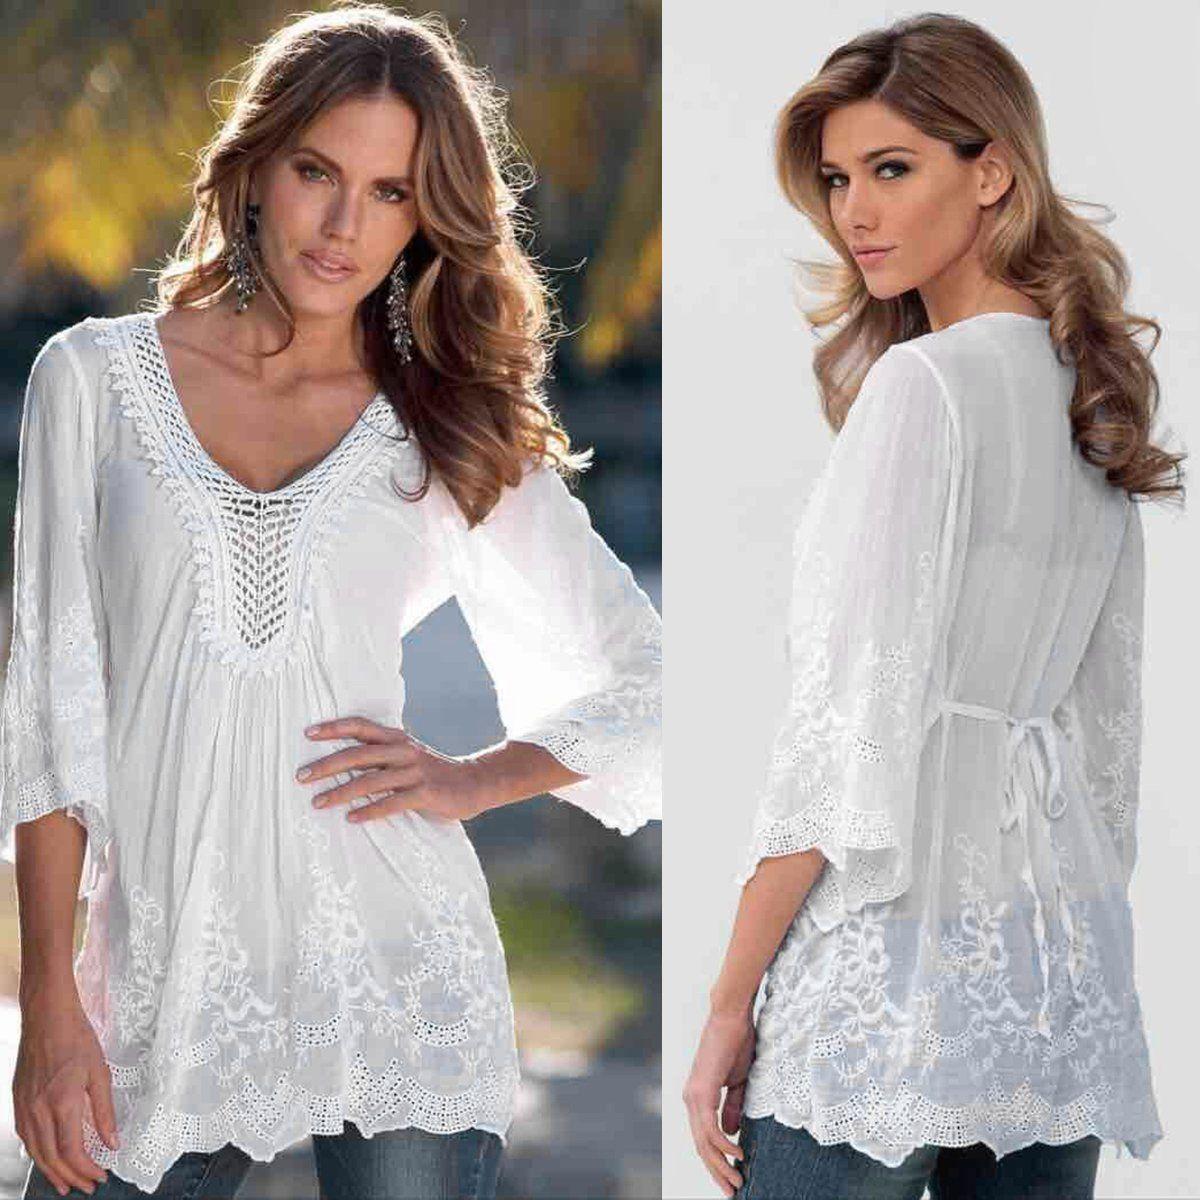 36317ee76914 Autumn Fashion Women Blouse Half Sleeve Lace Crochet Blouse Casual Loose  Floral Embroidery Tops Blouse Shirt blusas Plus